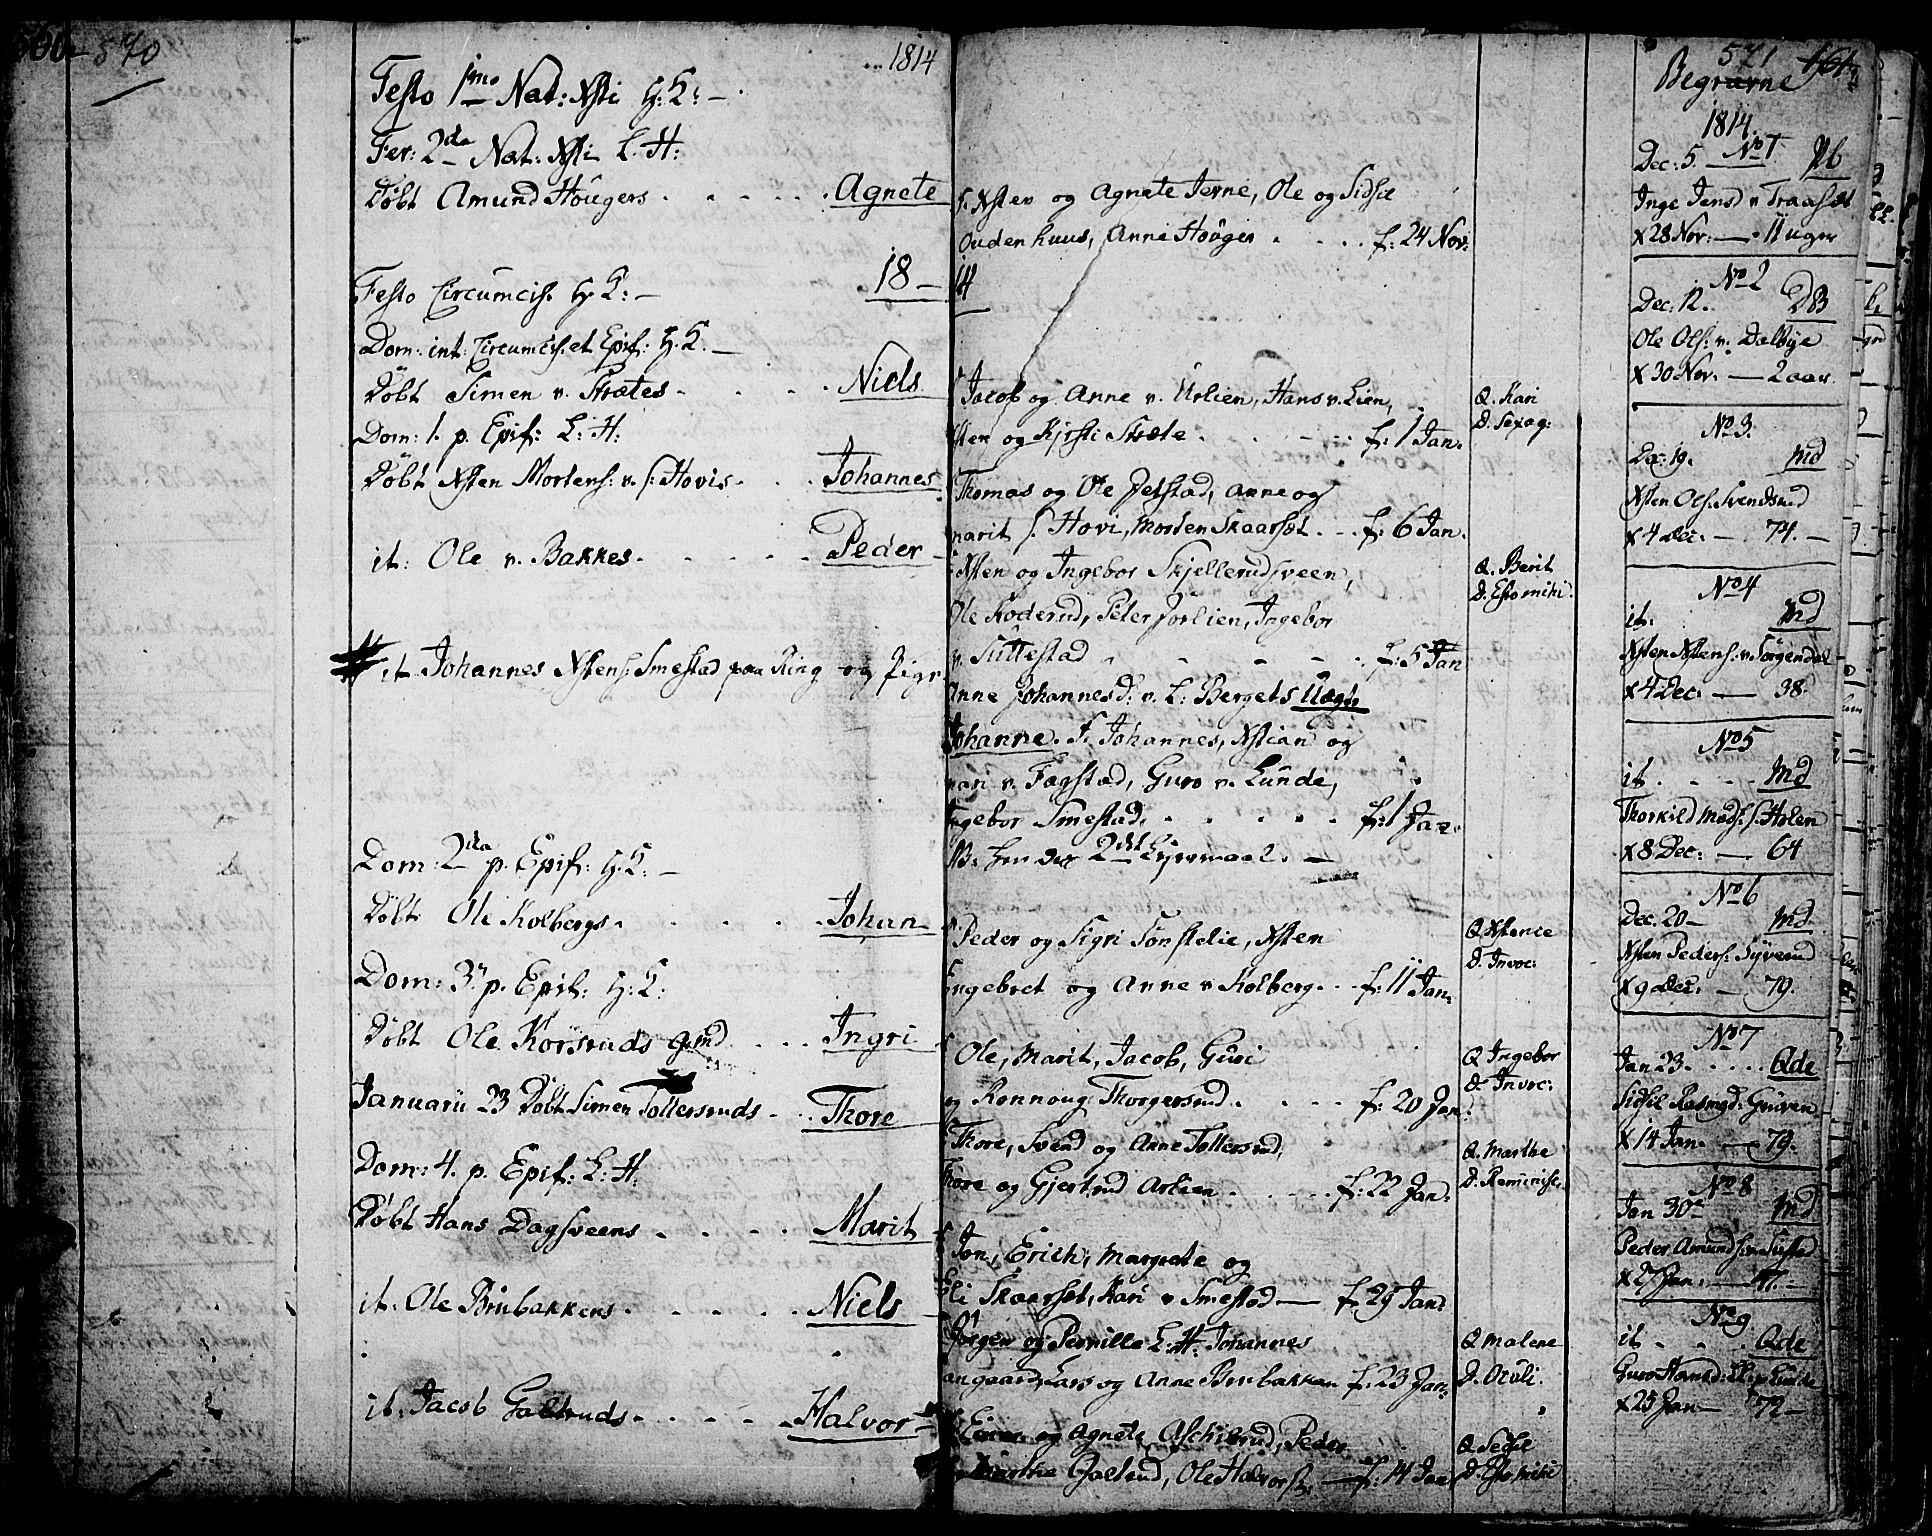 SAH, Fåberg prestekontor, Ministerialbok nr. 2, 1775-1818, s. 570-571